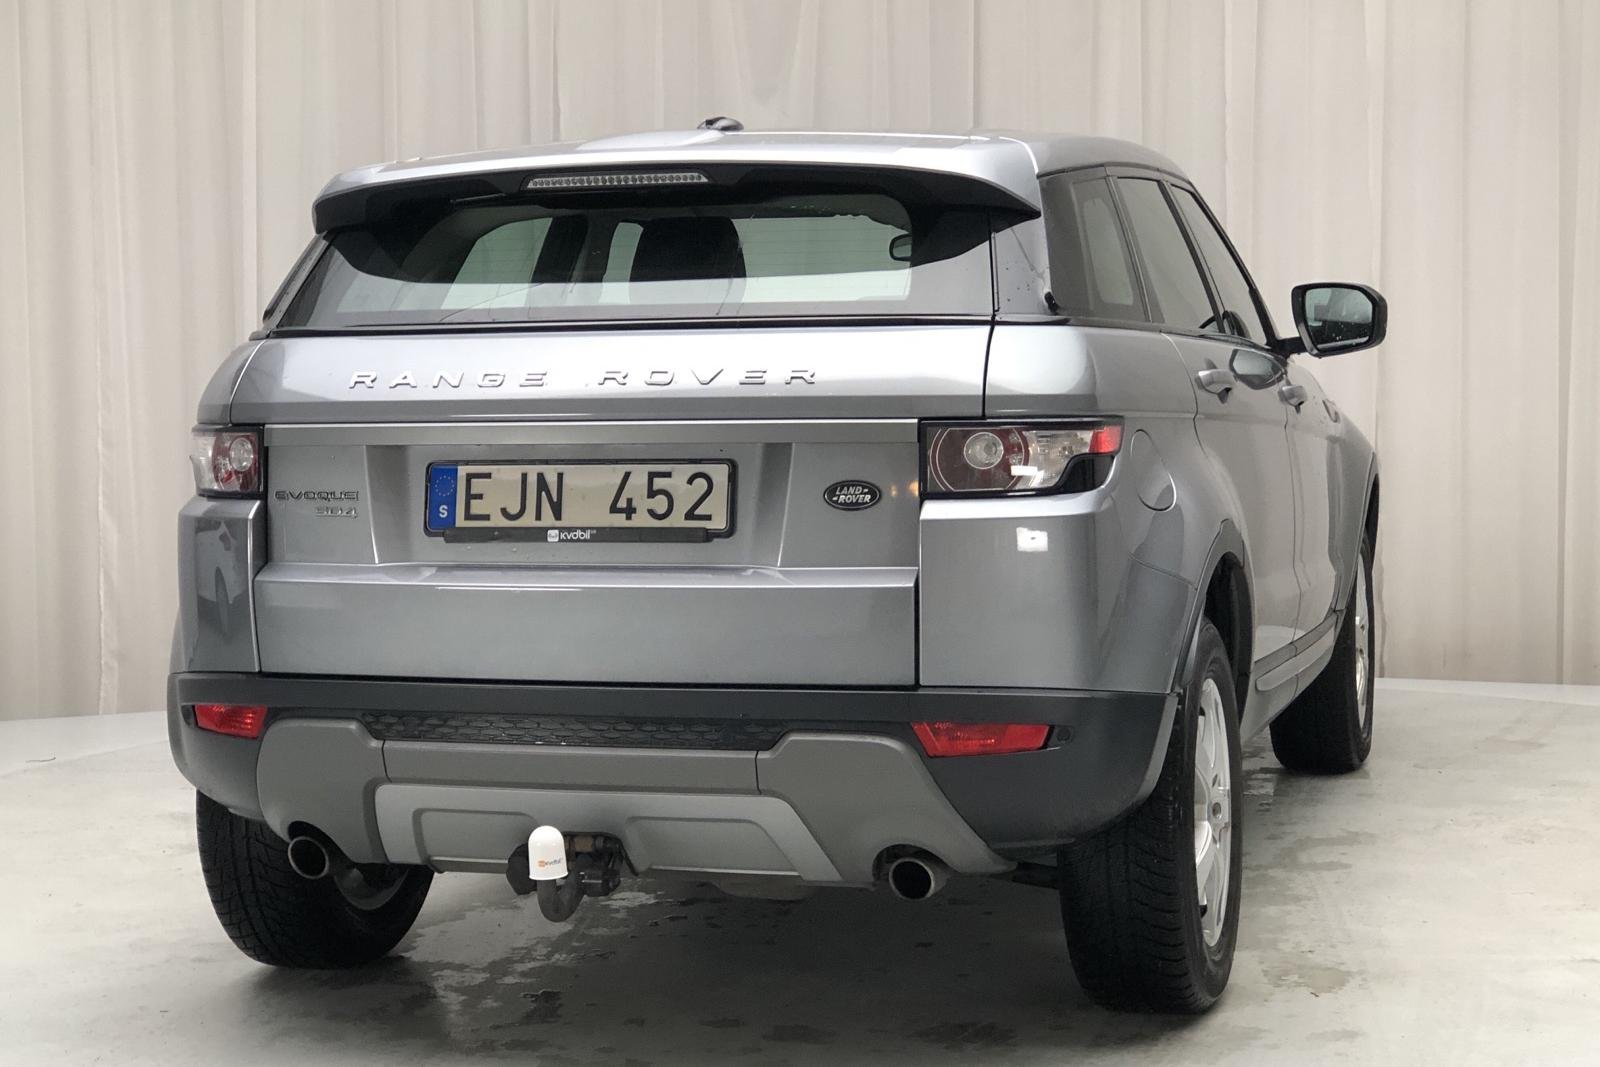 Land Rover Range Rover Evoque 2.2 SD4 5dr (190hk) - 121 100 km - Automatic - gray - 2012